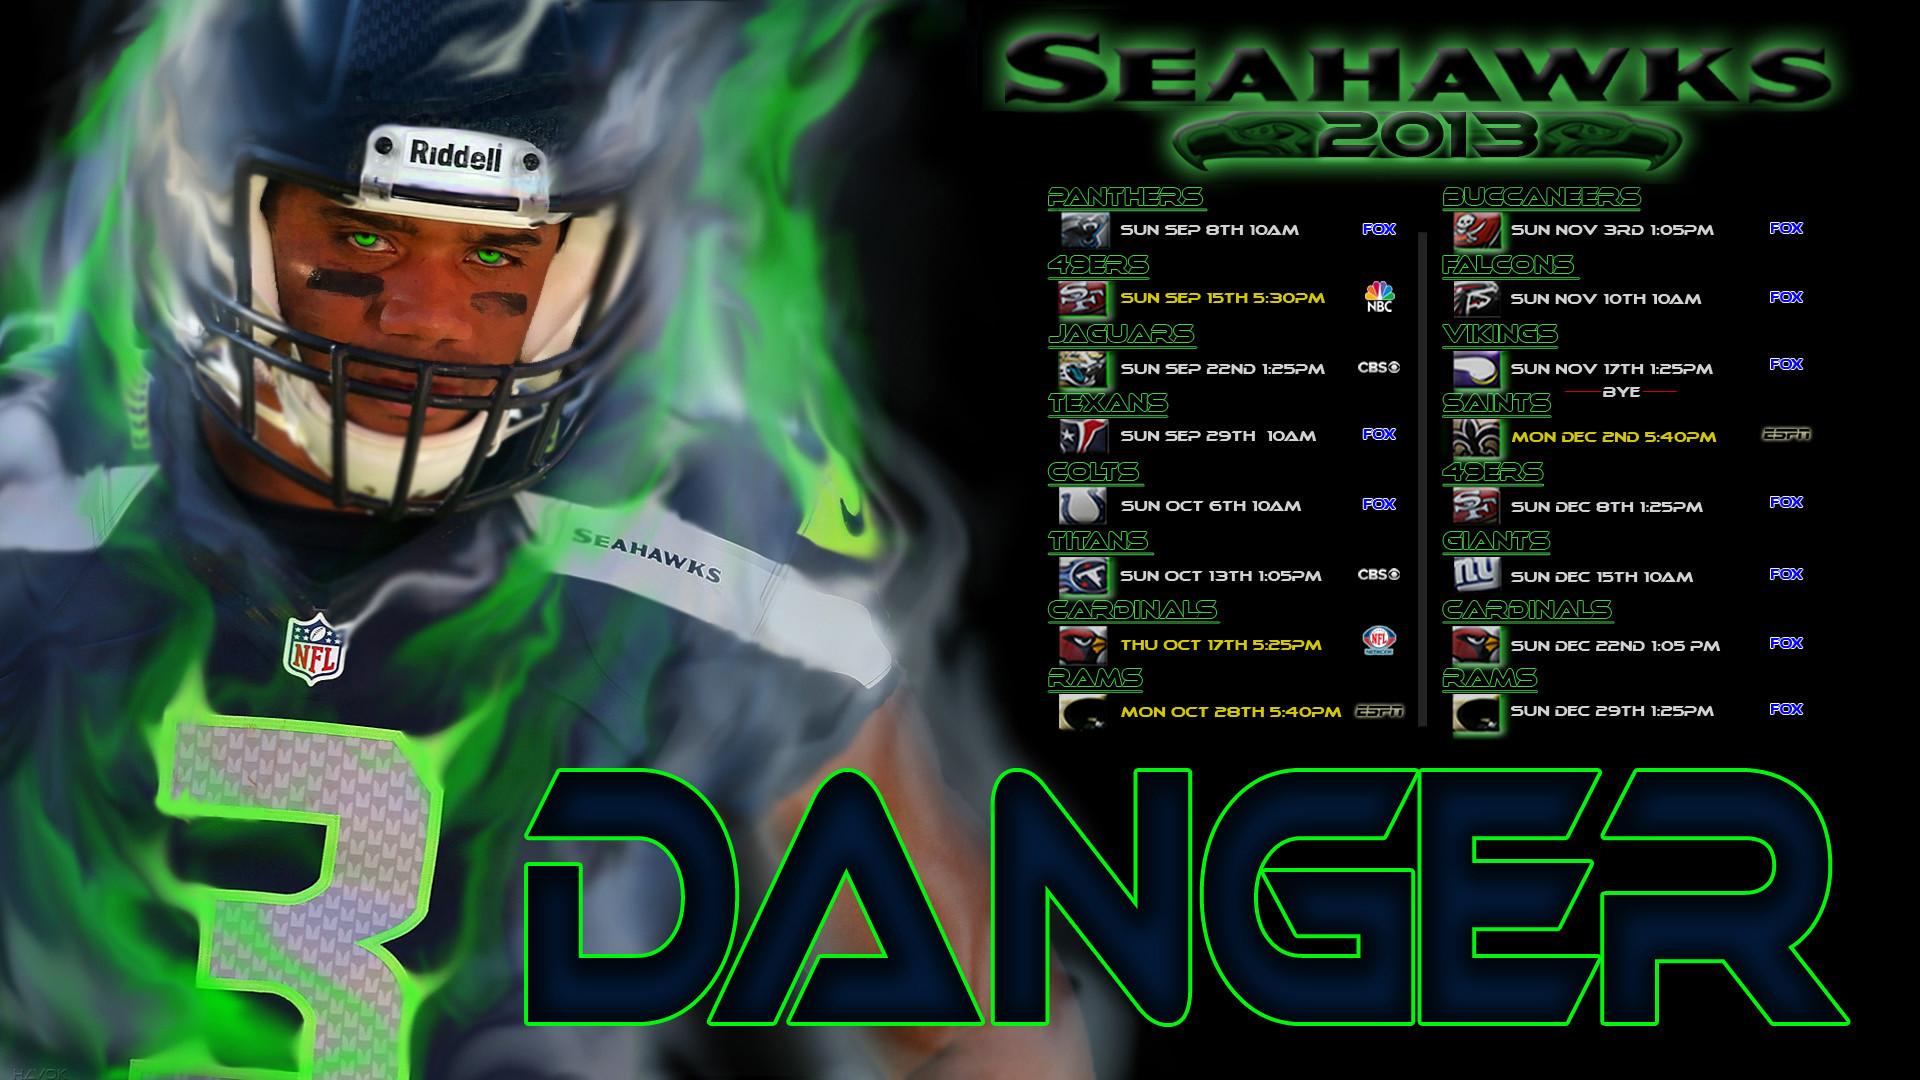 2013 Seatlle Seahawks football nfl hg wallpaper     130428 .